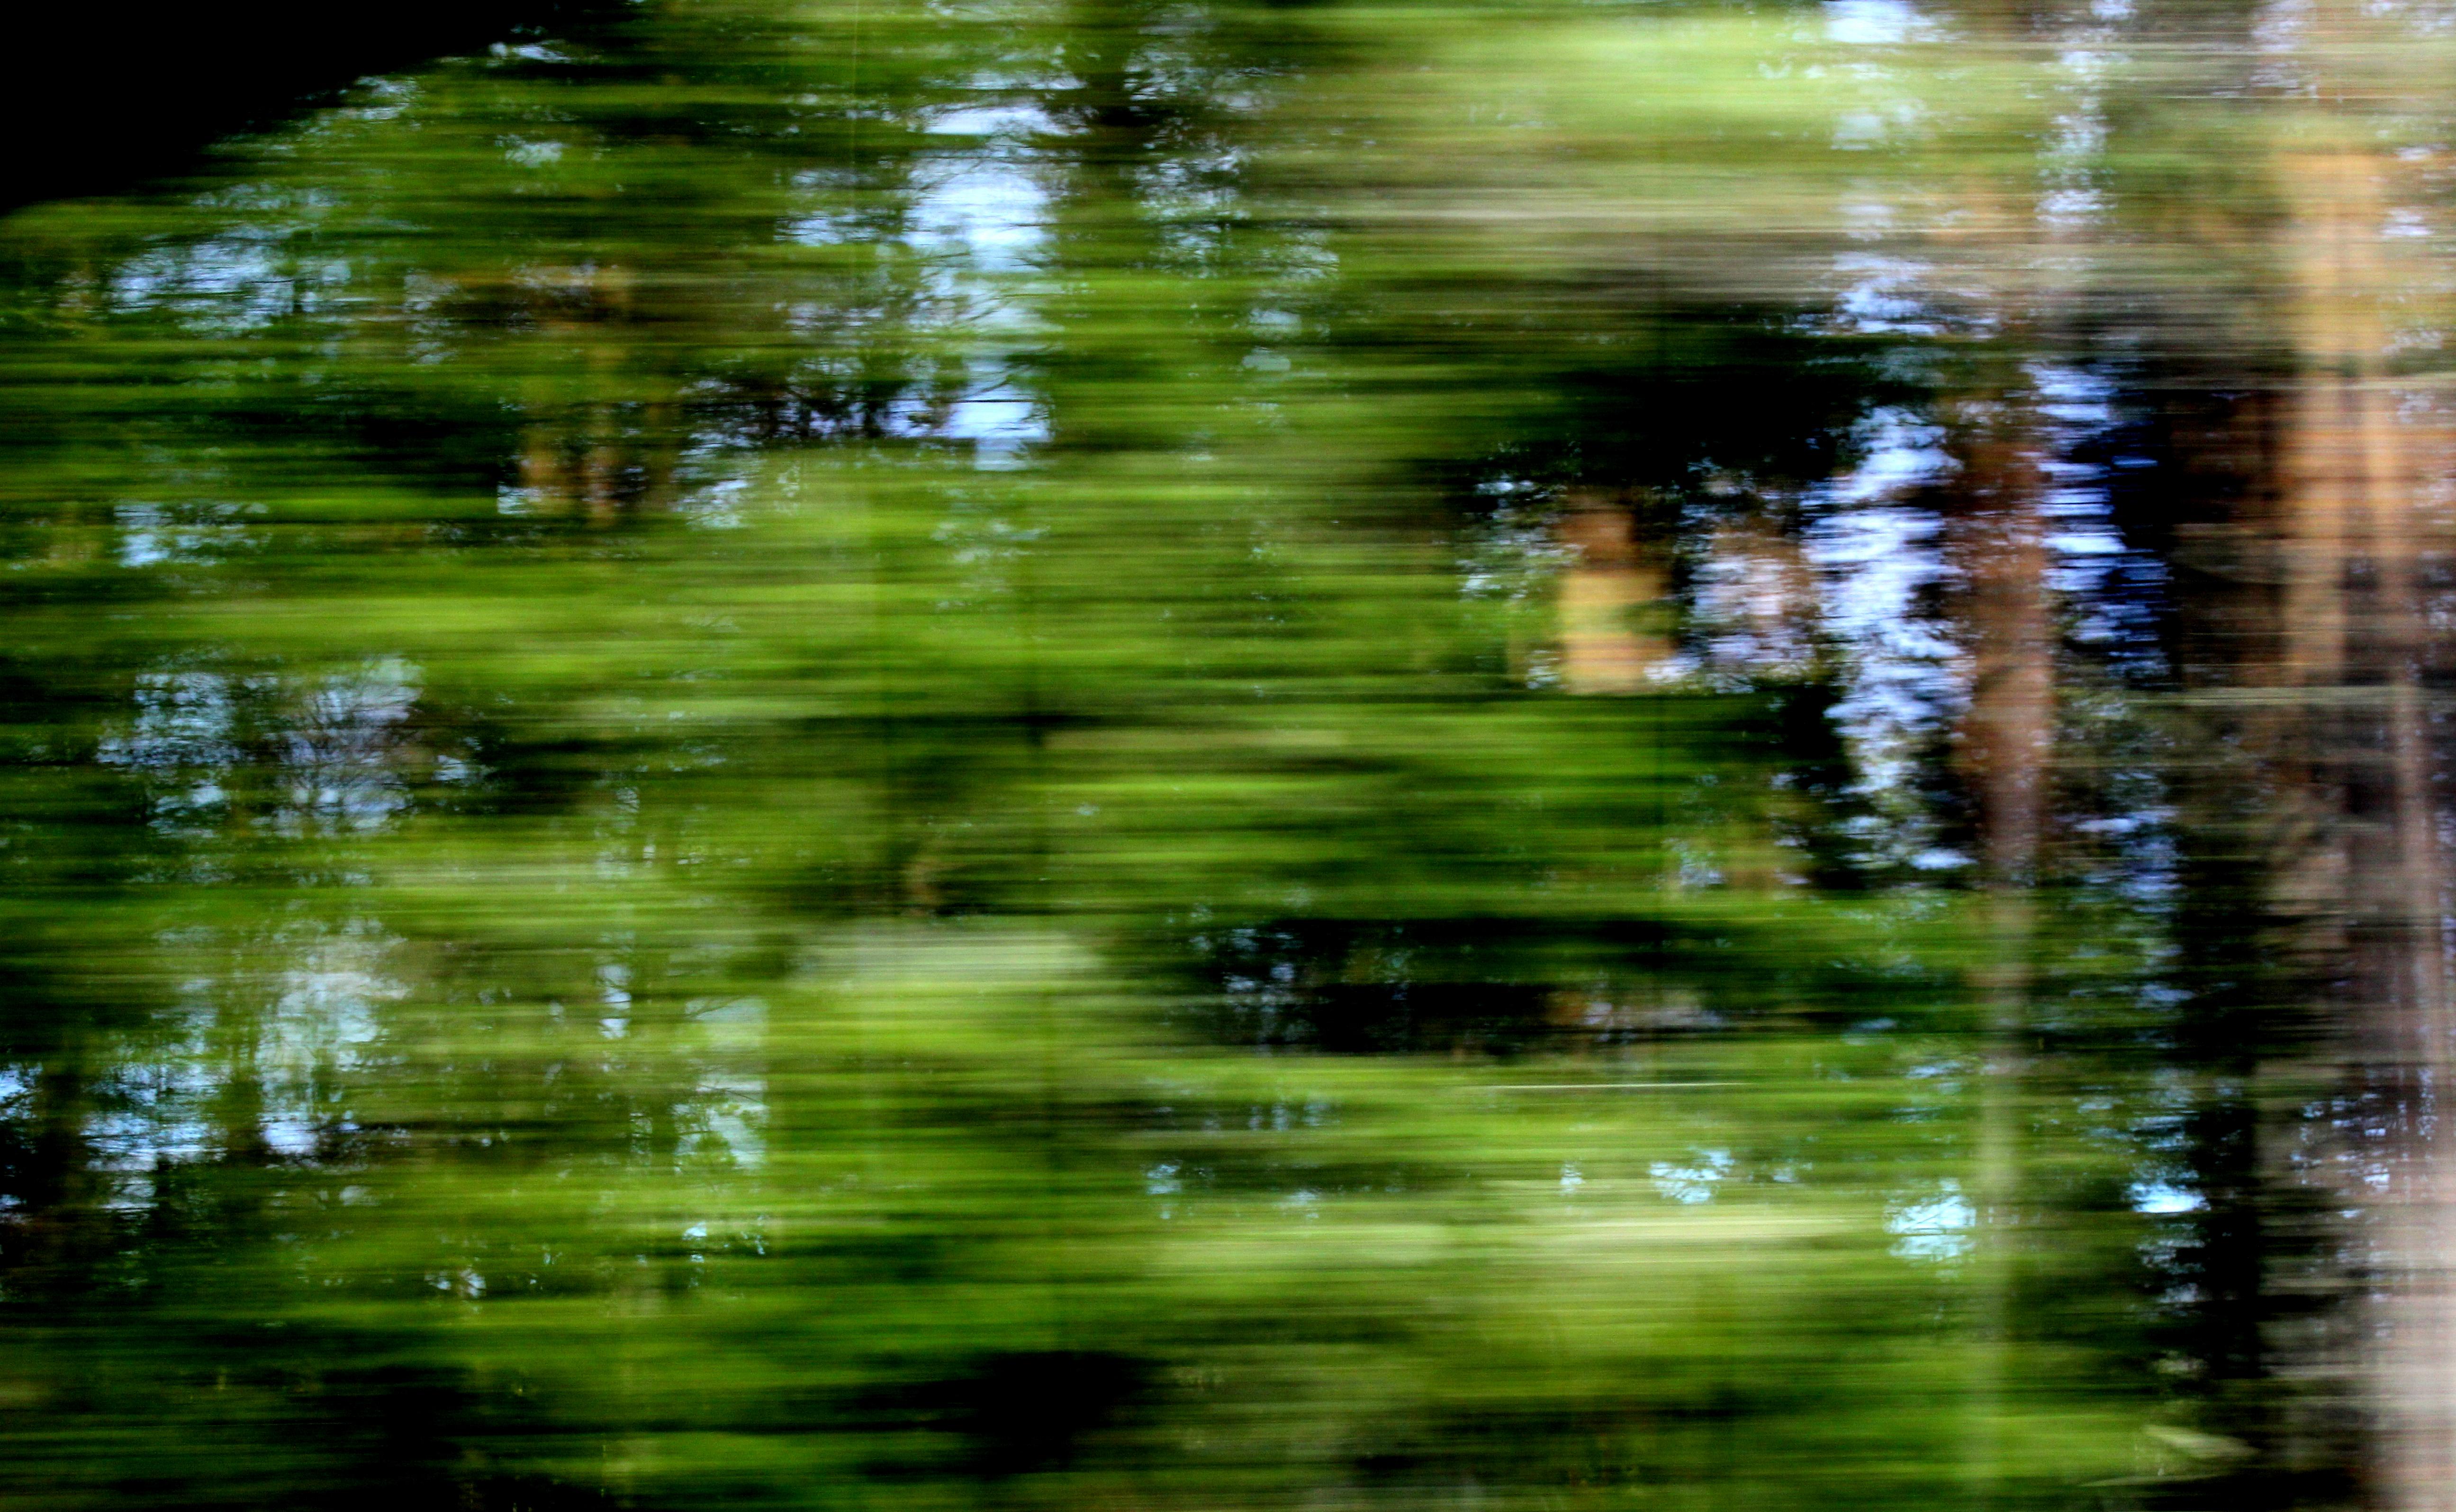 Skog-forest #3